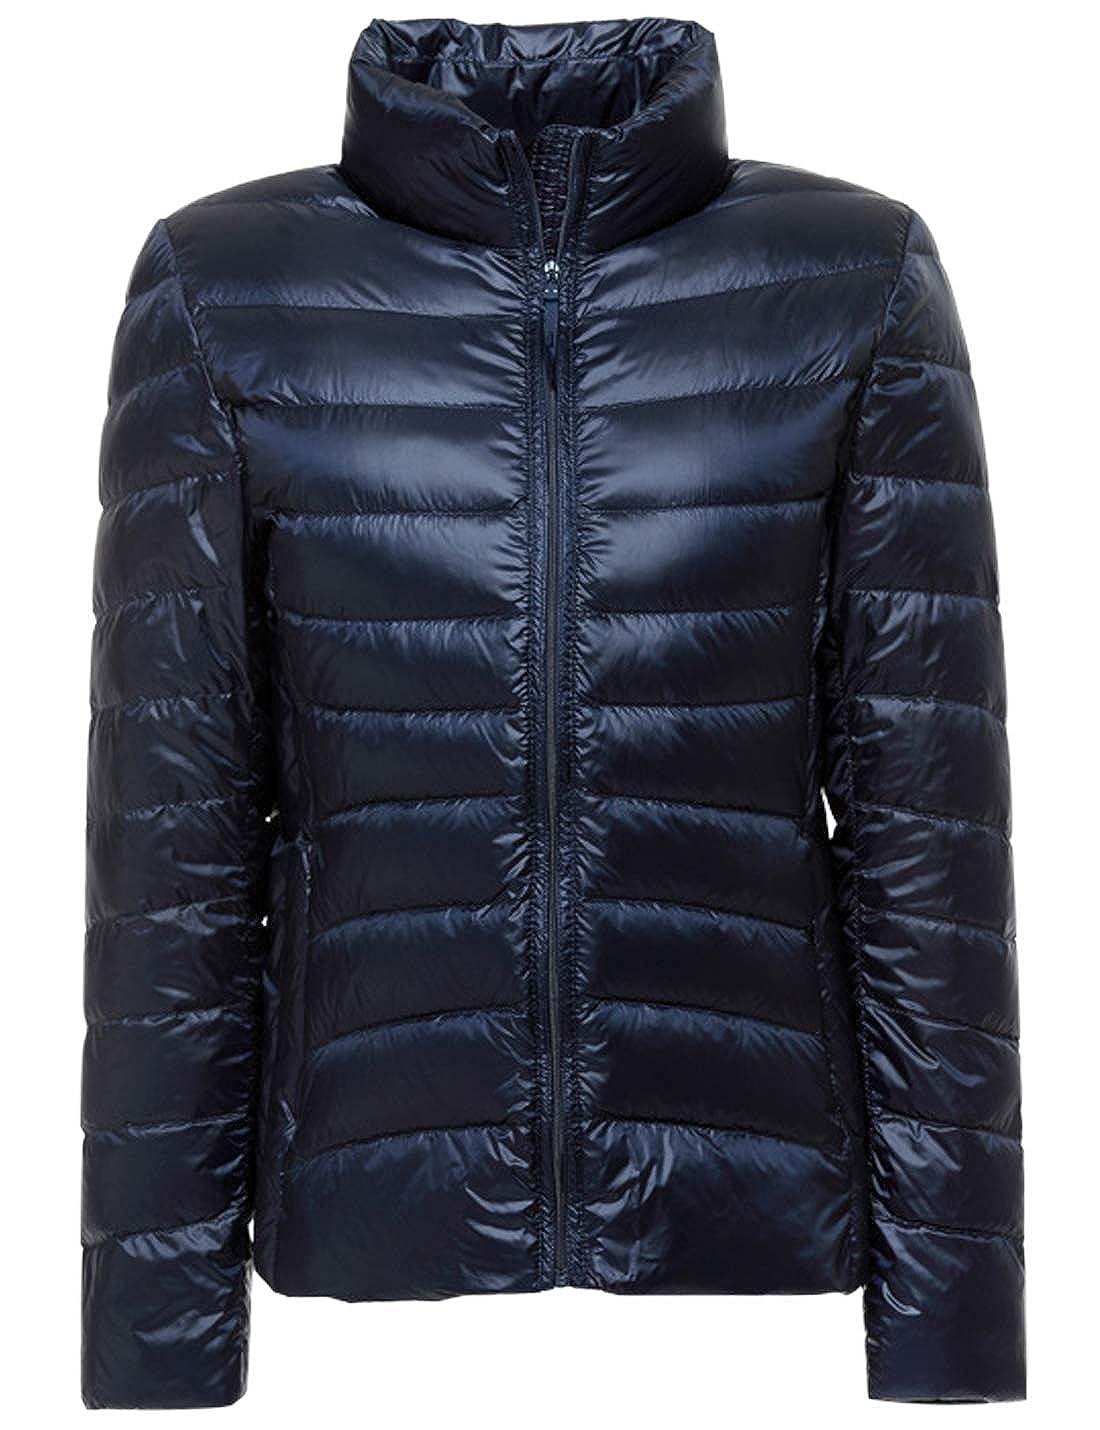 Jenkoon Women's Casual Lightweight Slim Short Puffer Down Jacket Puffer Down Coats